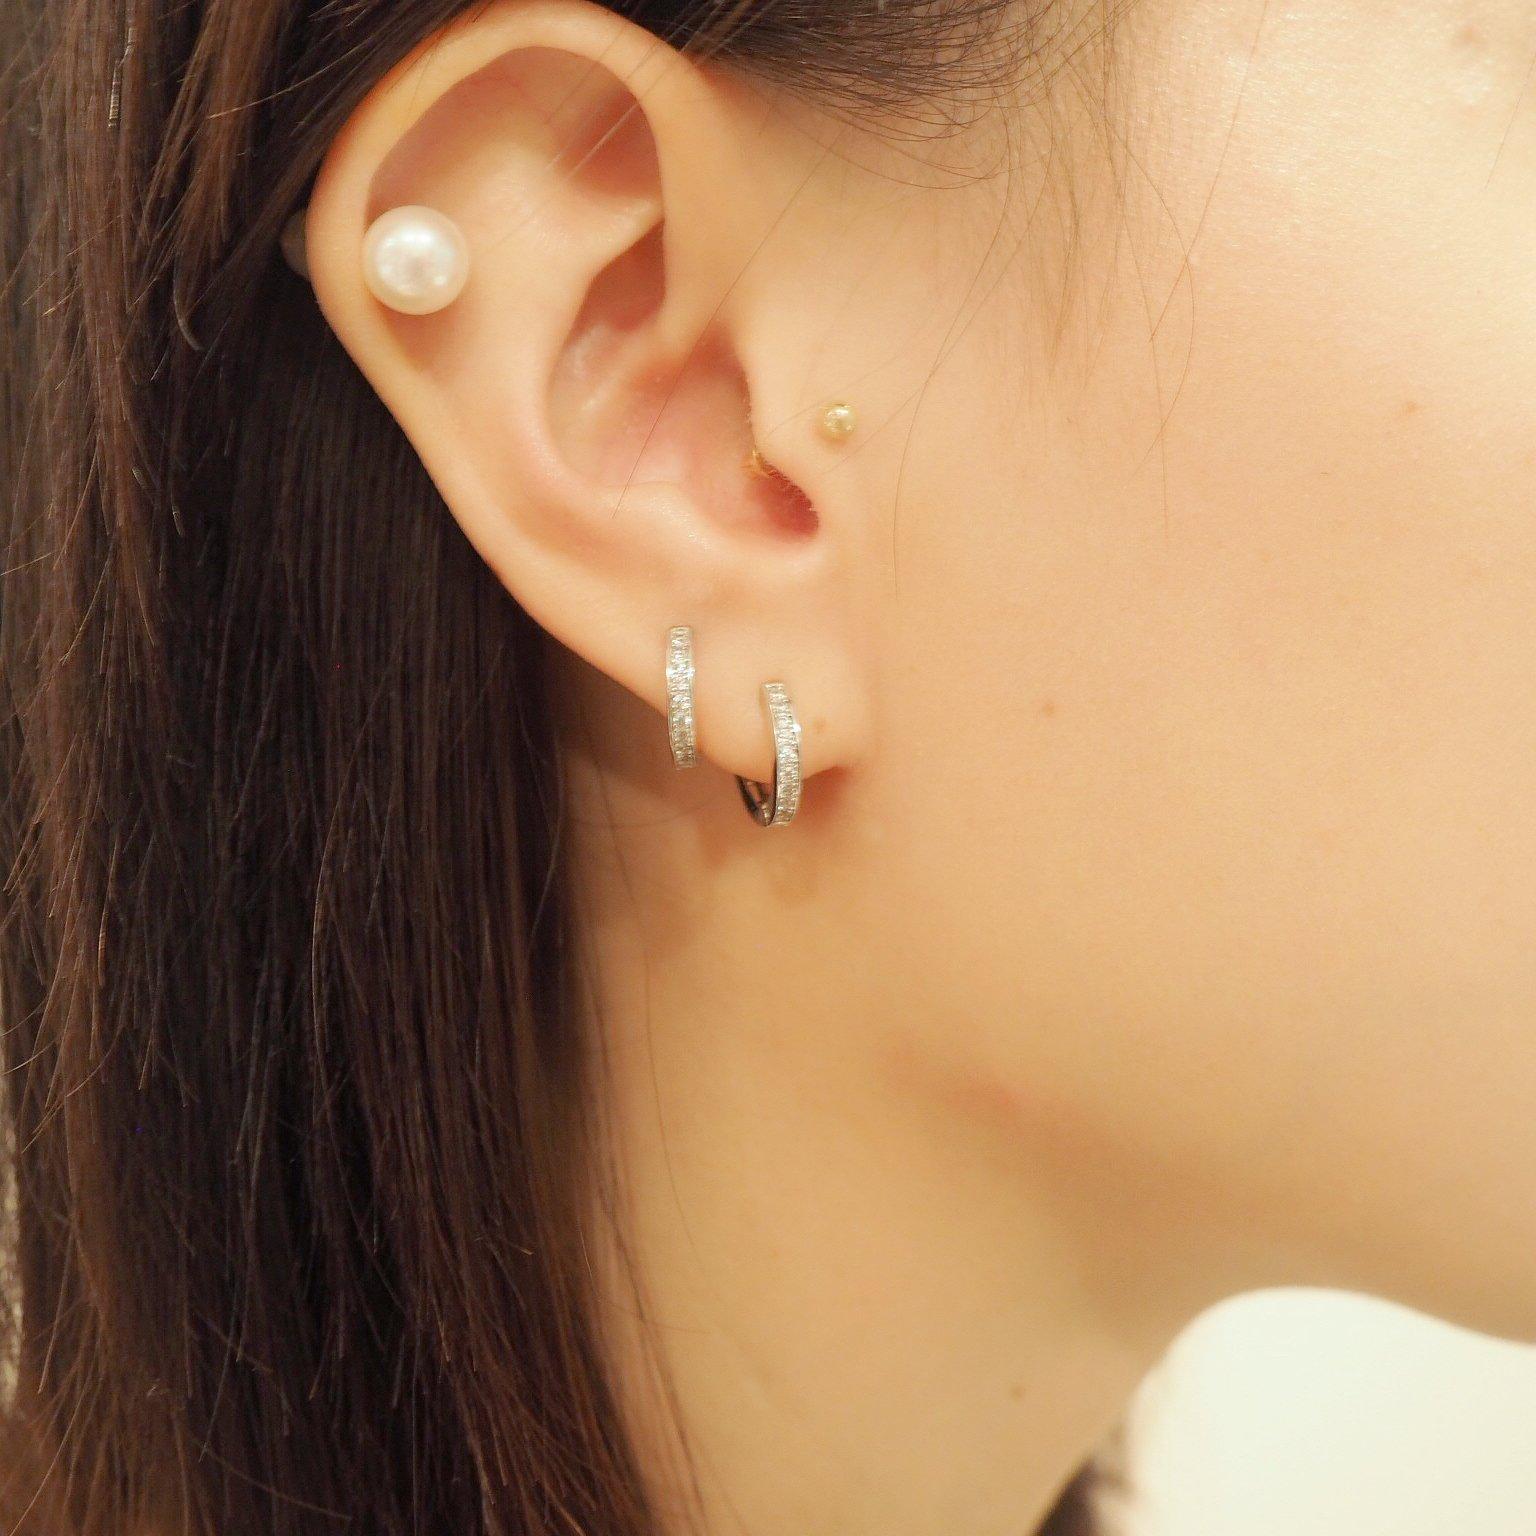 Yellow Gold Plated Sterling Silver Cubic Zirconia Huggie Hoop Earrings by Spoil Cupid (Image #4)